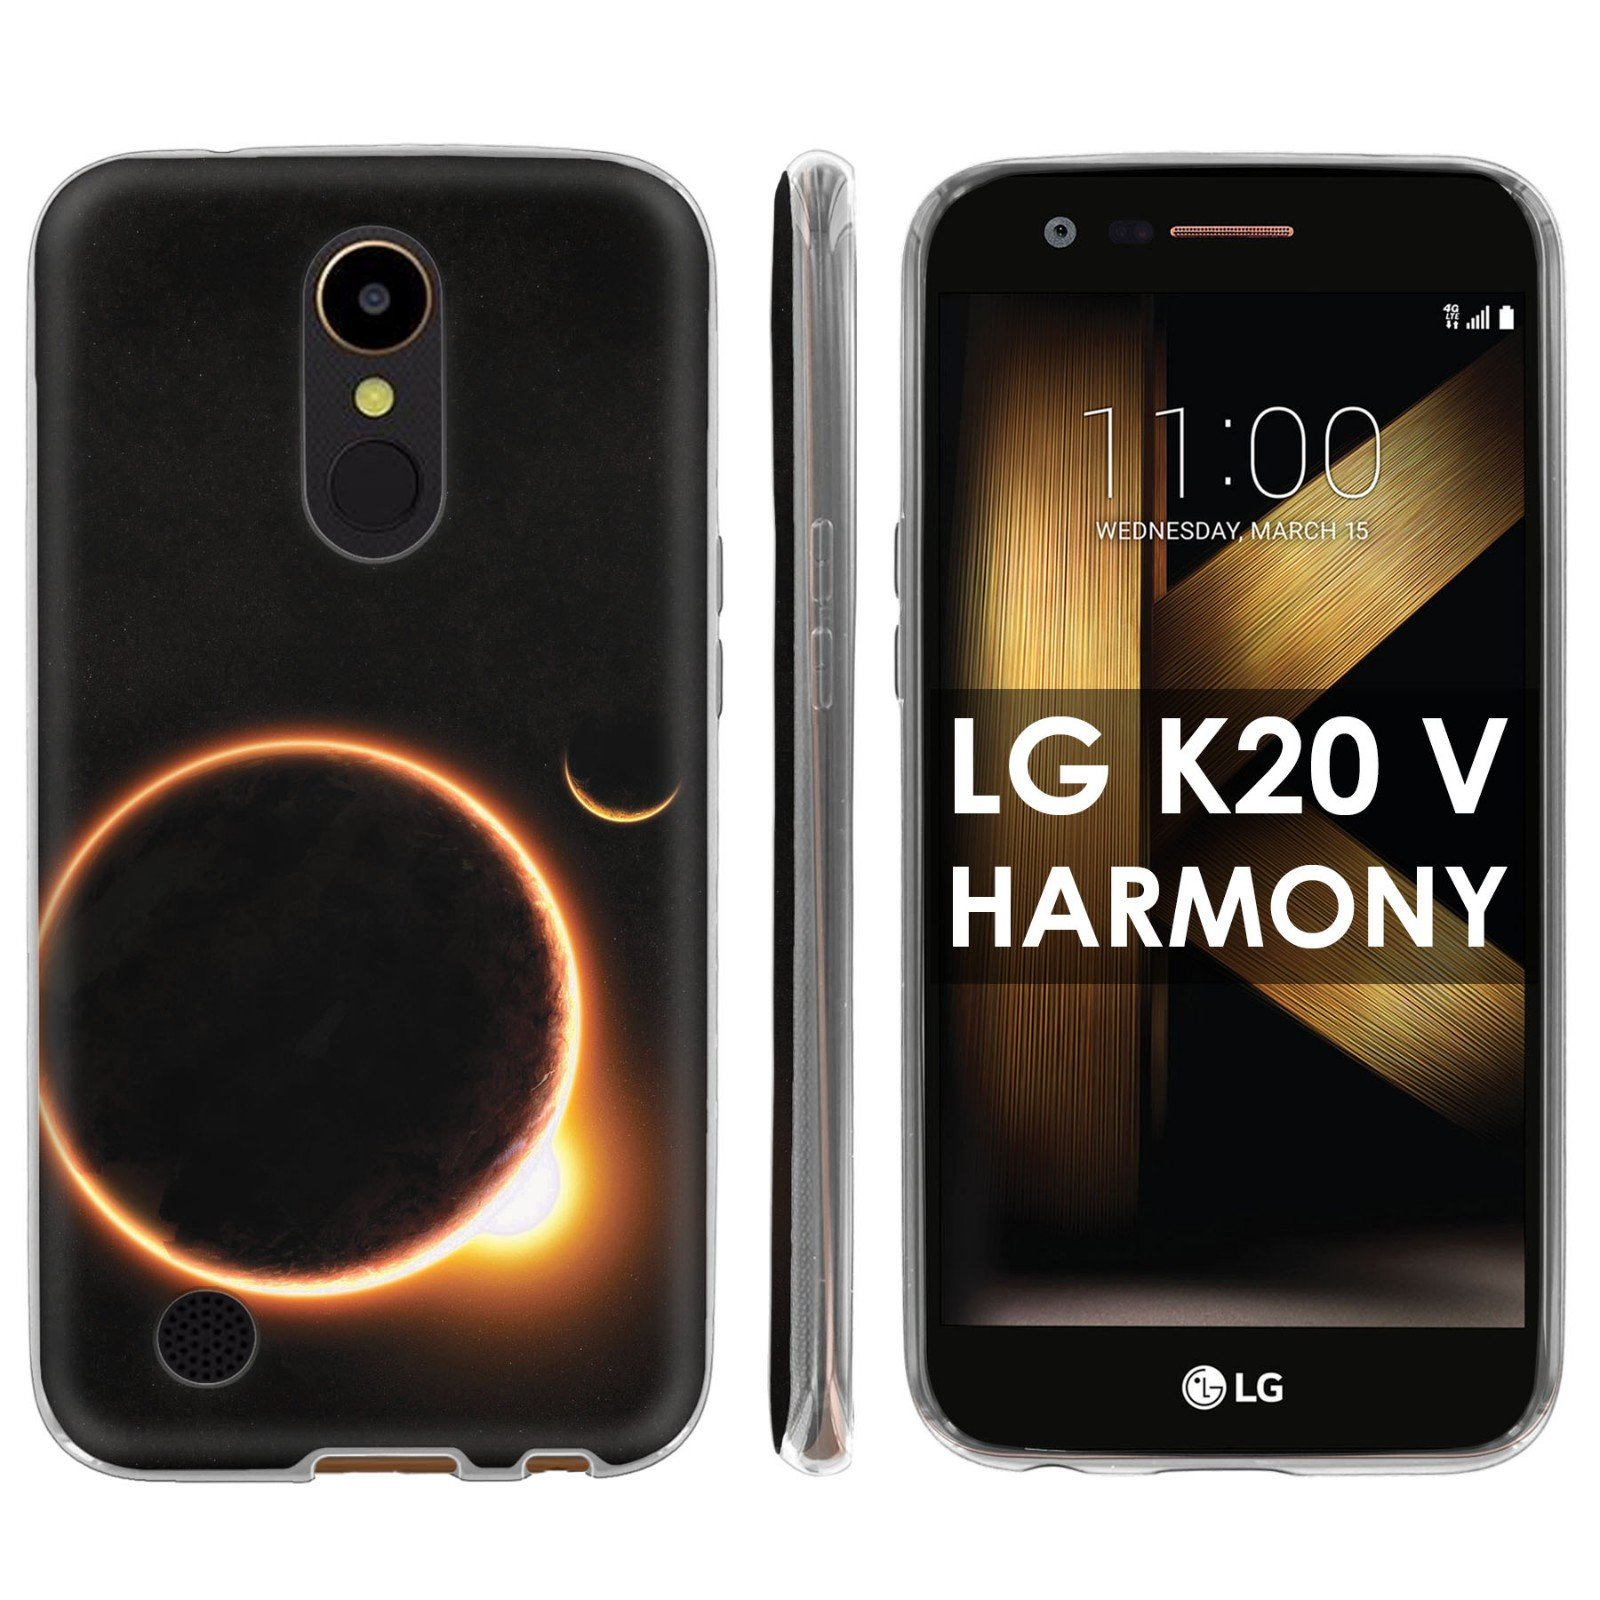 LG [K20 V/ K20 plus] LG Harmony Soft Mold [Mobiflare] [Clear] Thin Gel Protect Cover - [Solar Eclipse] for LG [K20 V/ K20 plus/ Harmony] [5.3 '' Screen]